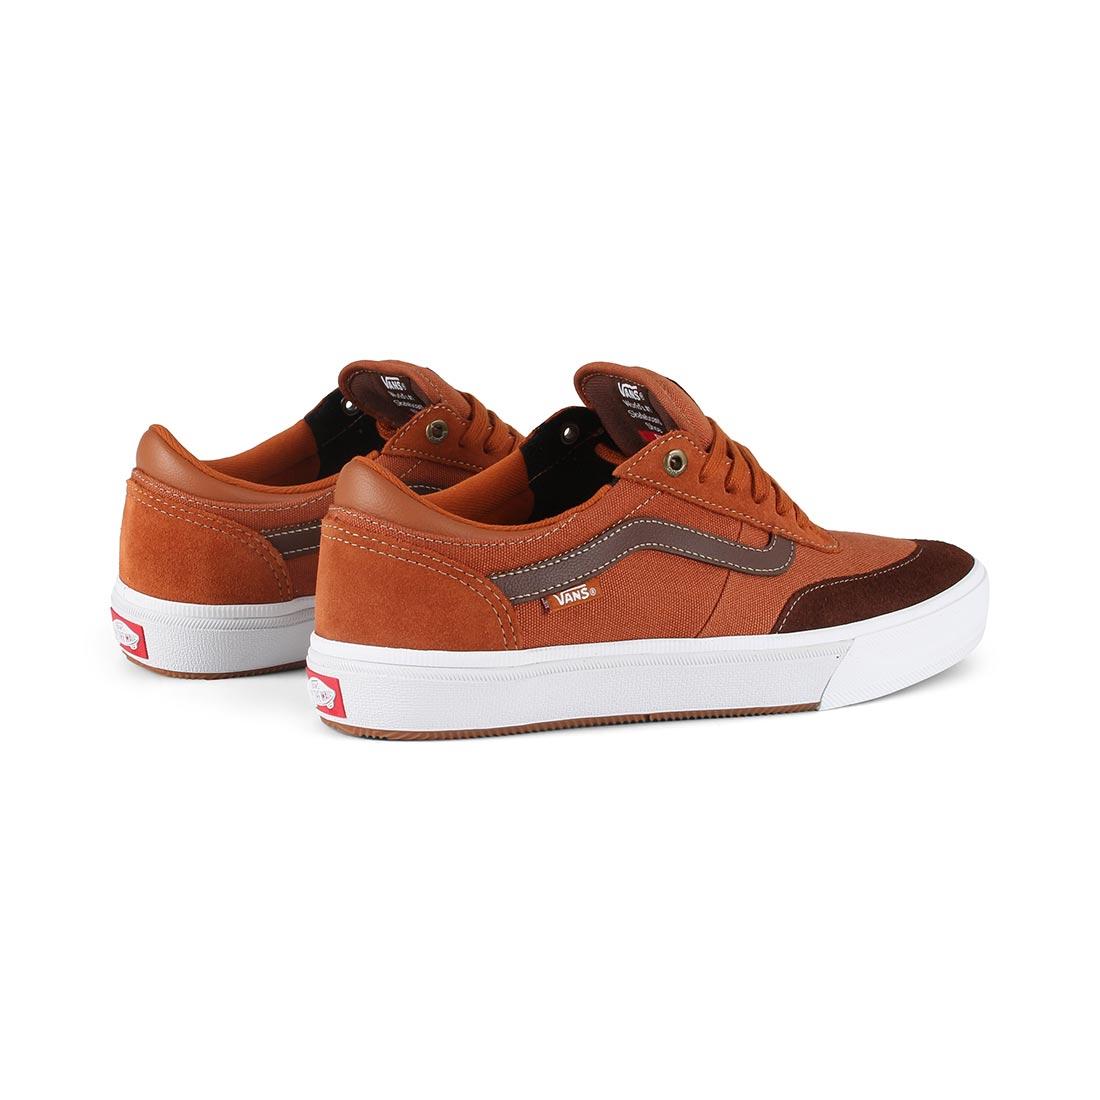 bebcbcd3230 Vans Gilbert Crockett 2 Pro Shoes - Leather Brown   Potting Soil